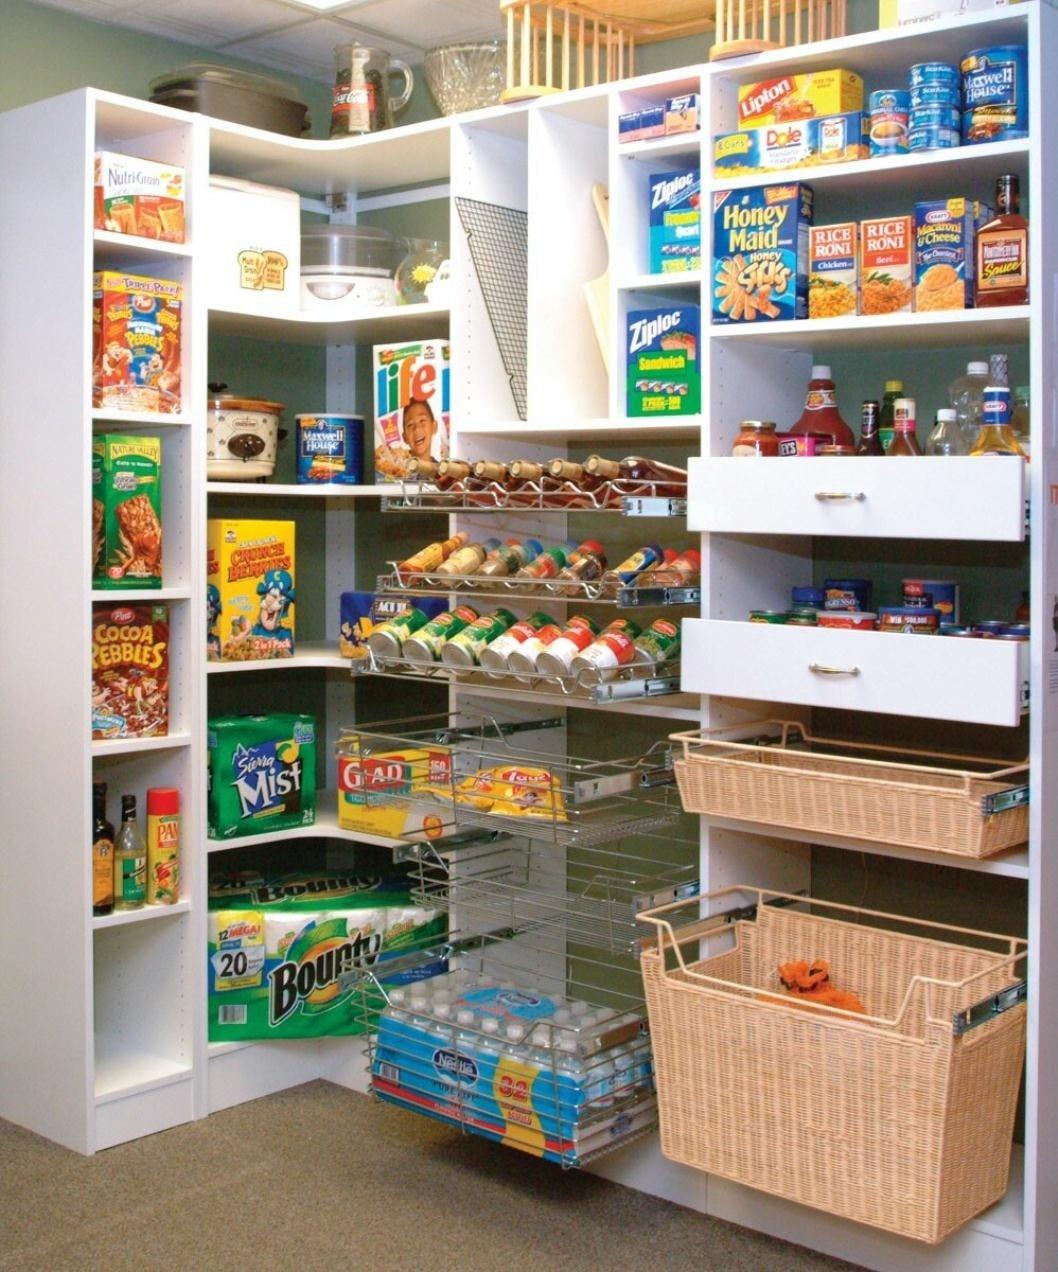 10 Ideal Walk In Pantry Shelving Ideas fresh kitchen corner walk in pantry 15681 2020